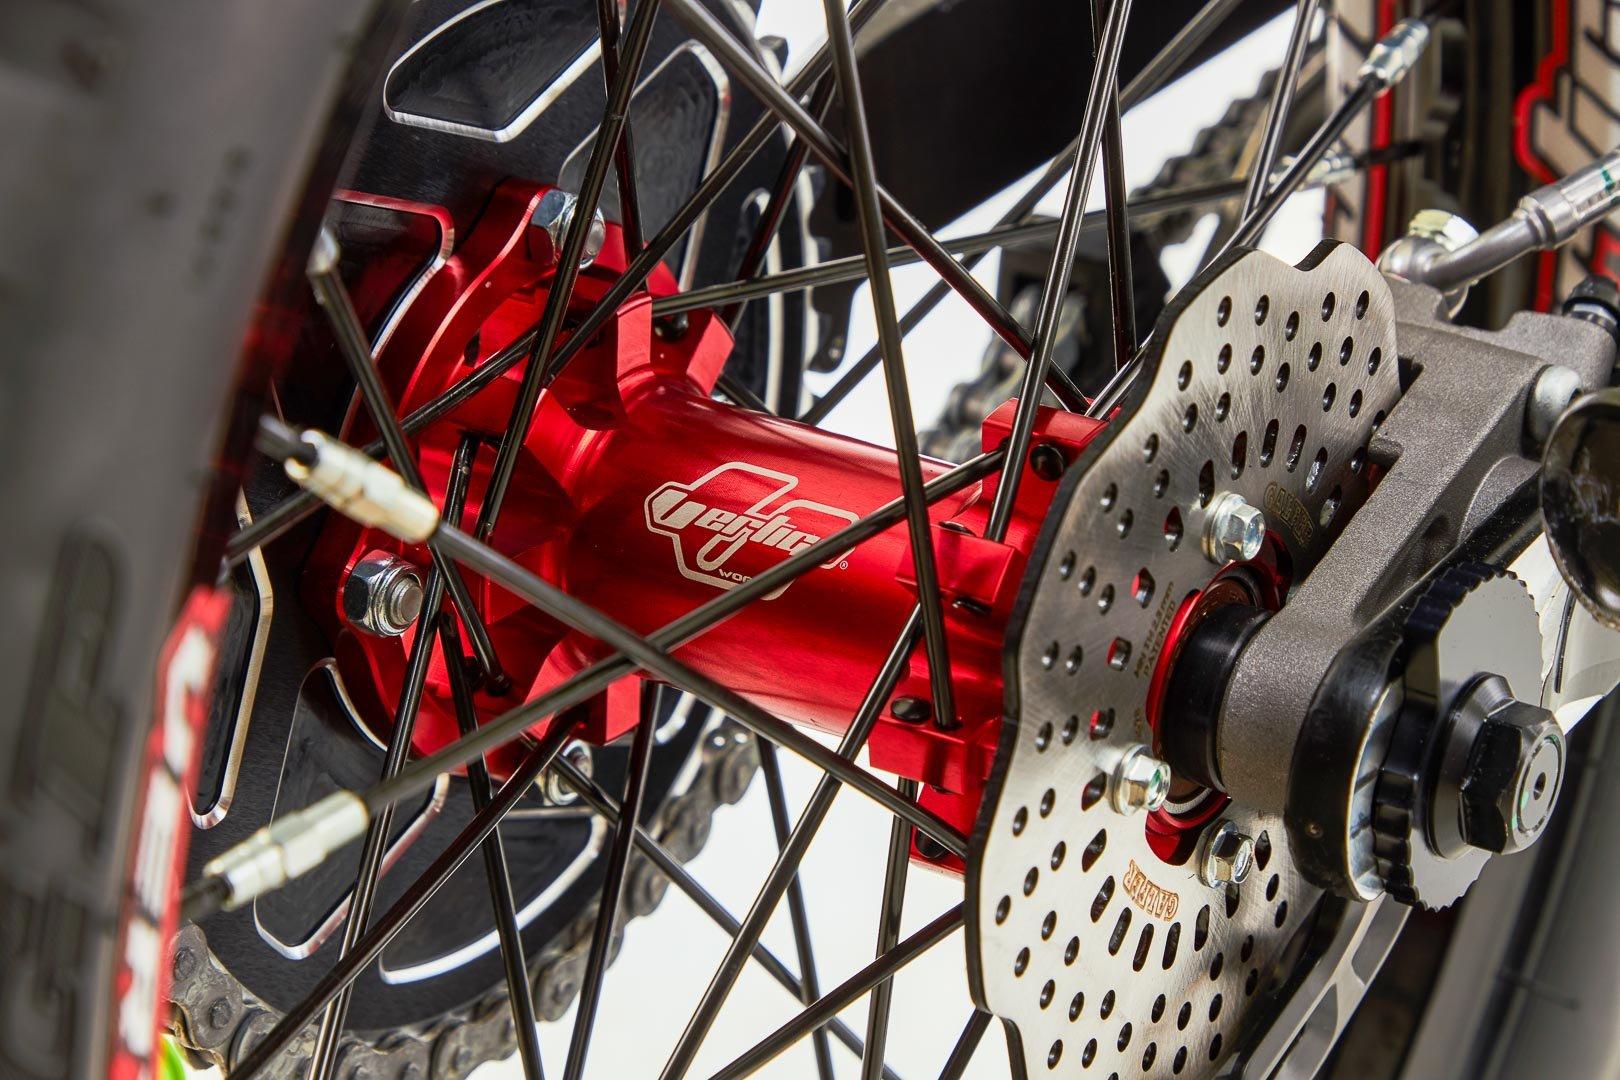 2020 Vertigo Vertical R2 First Look - Trials bike